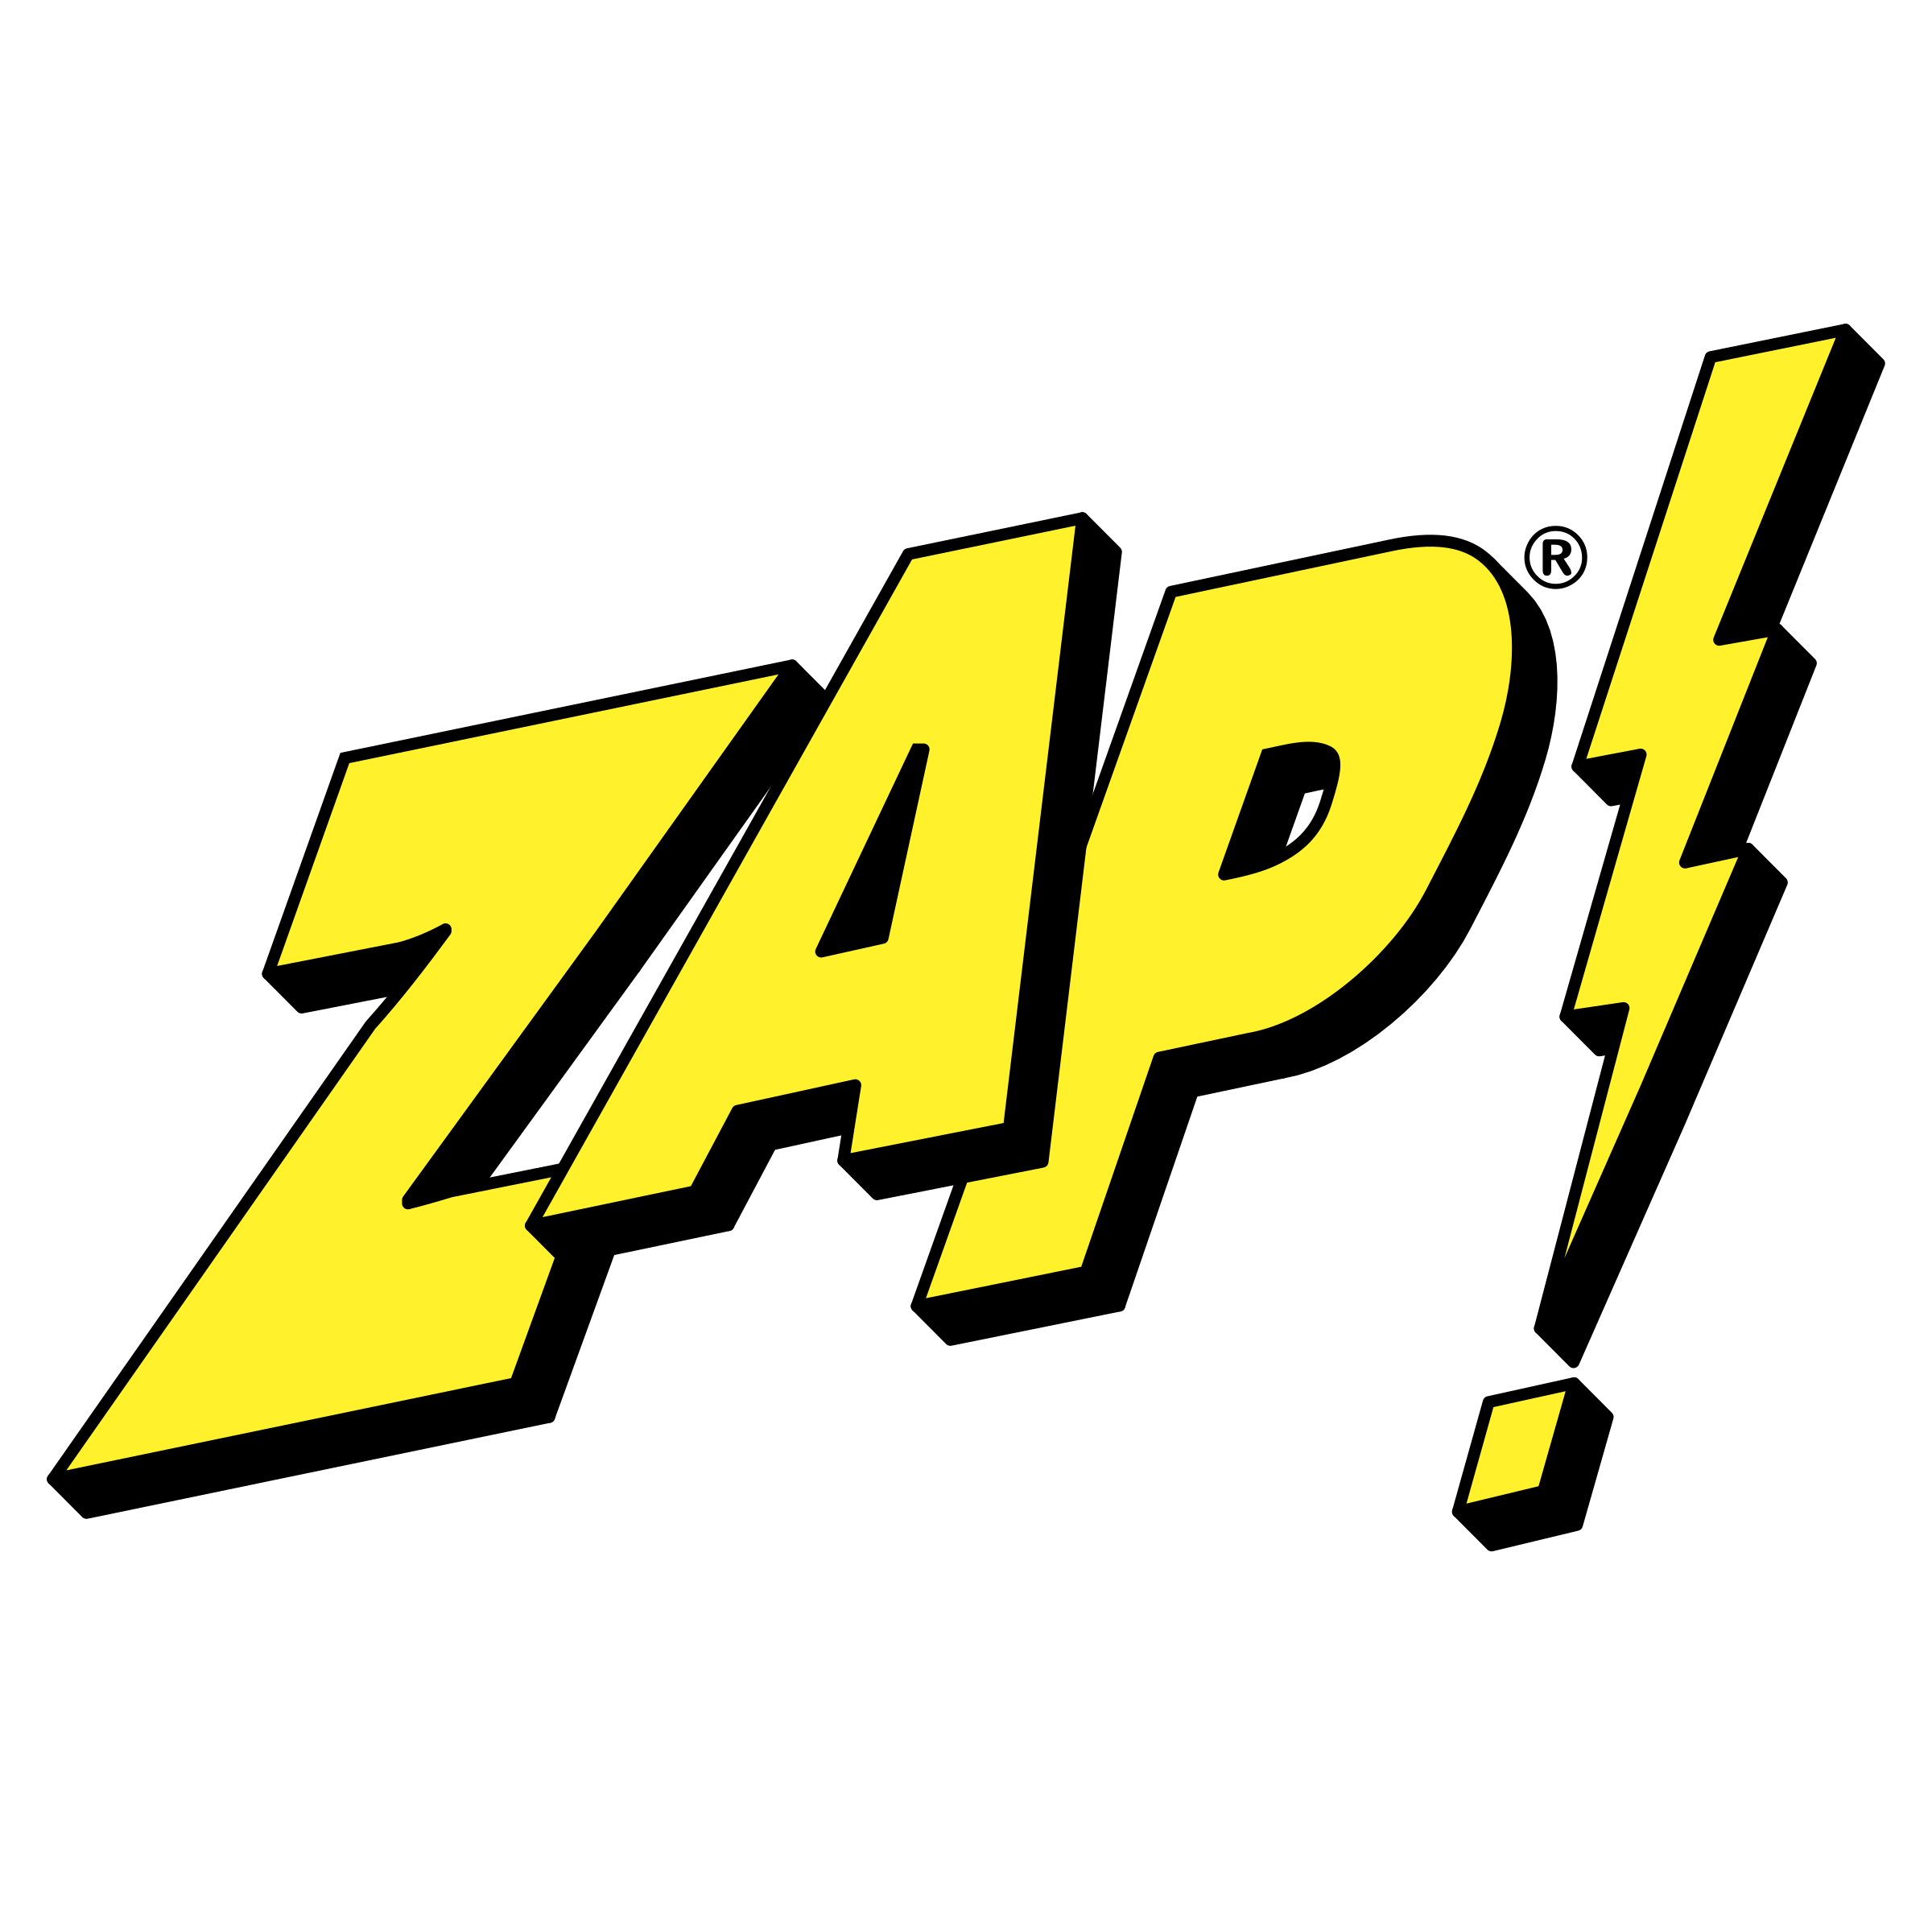 ZAP! Logo PNG Transparent & SVG Vector.